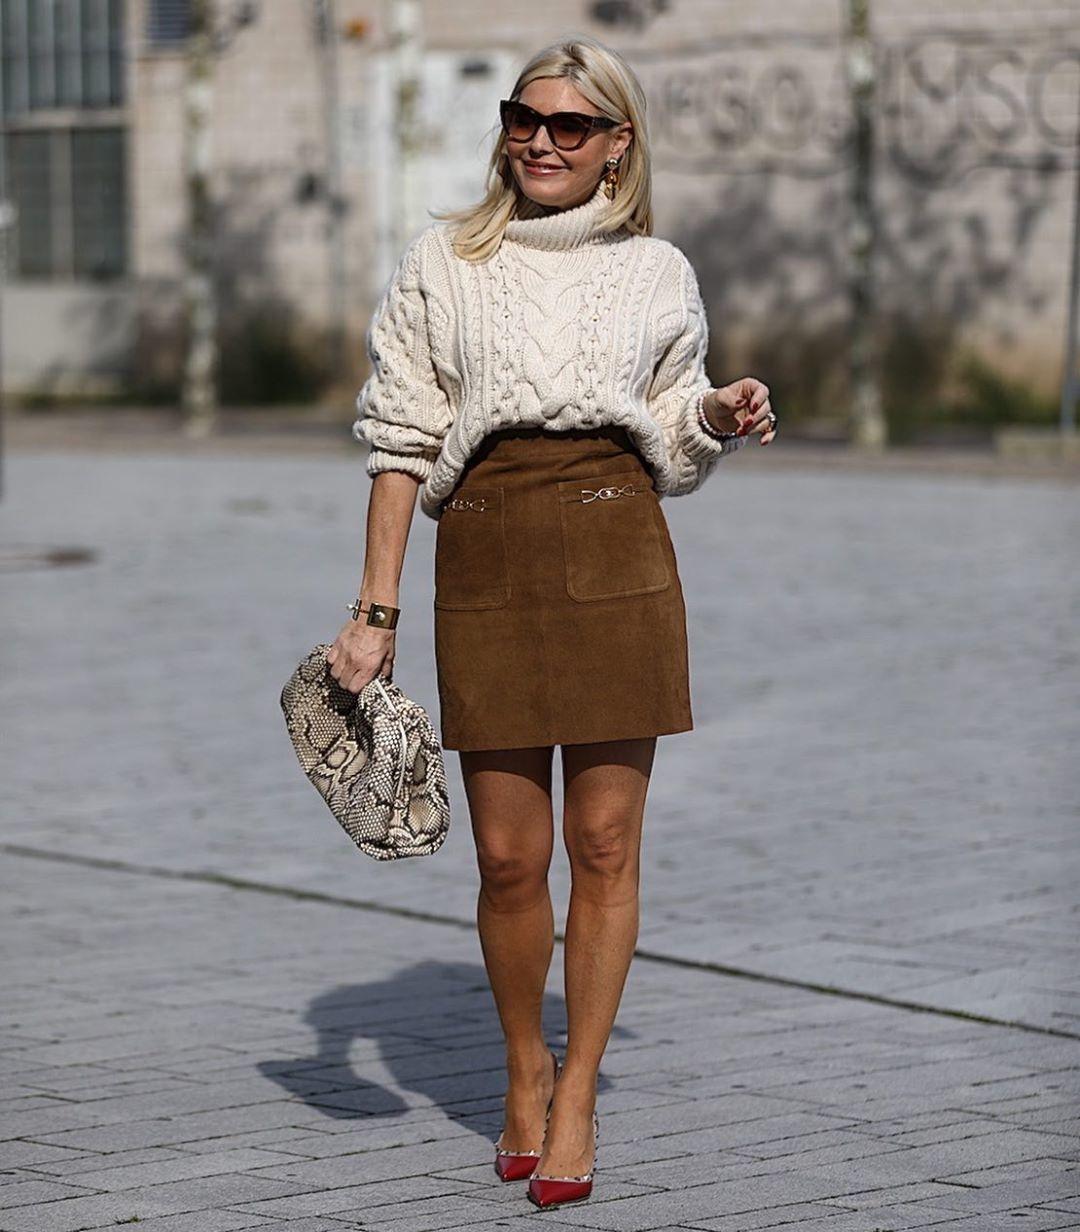 sweater turtleneck sweater celine mini skirt pumps handbag snake print